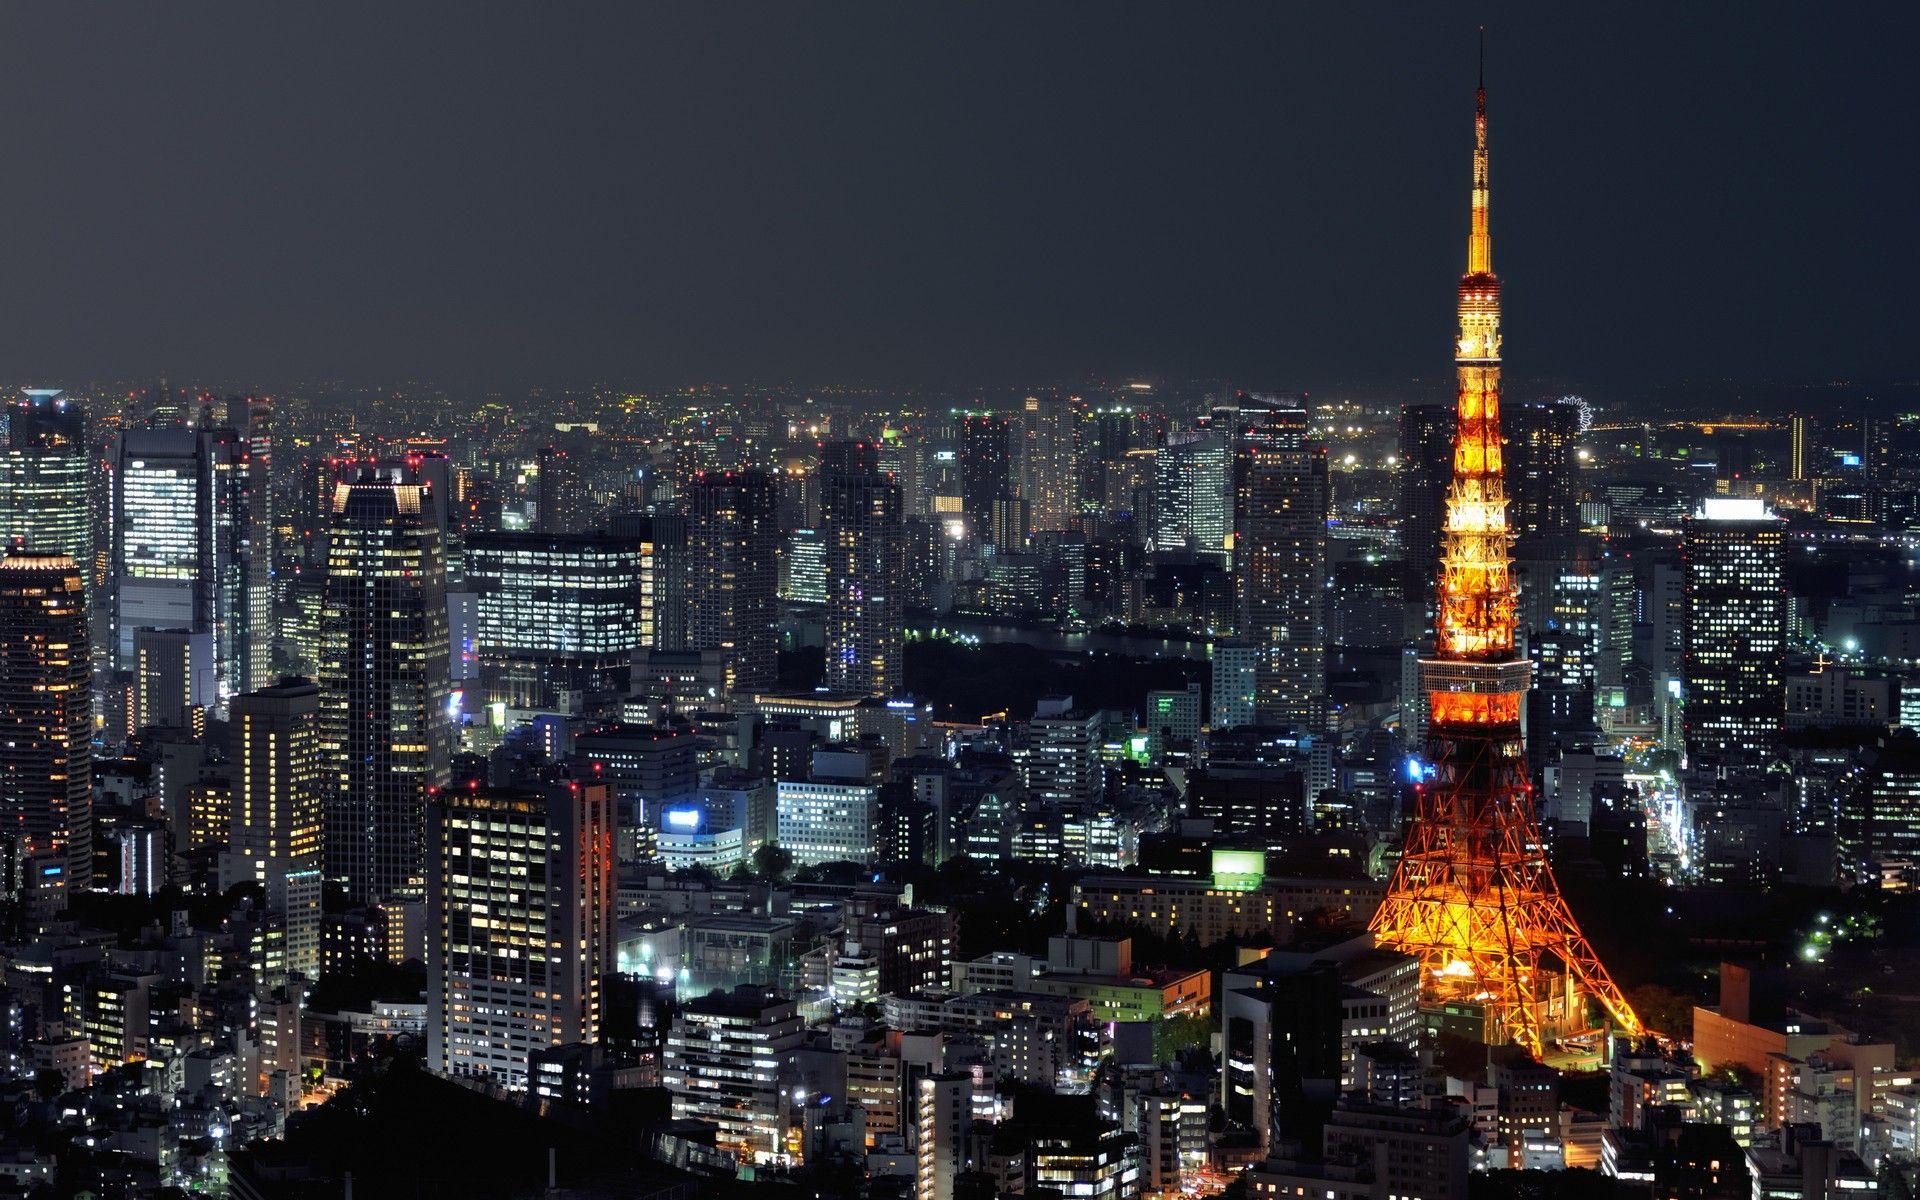 Tokyo Wallpaper Full Hd Landscape Wallpapers Pinterest